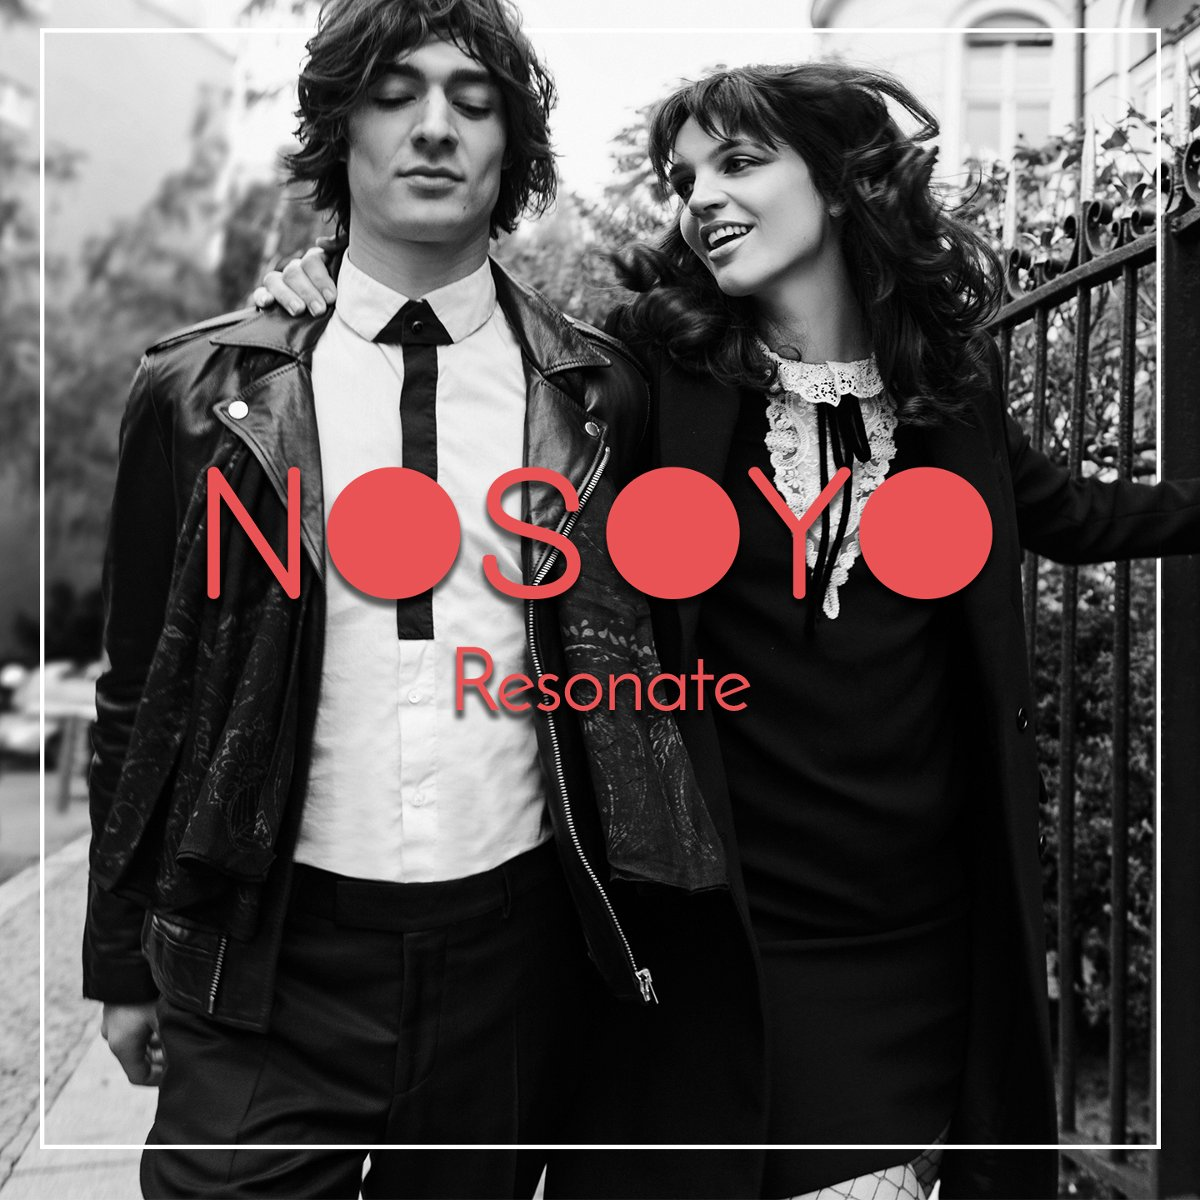 Nosoyo Music Berlin und Amsterdam